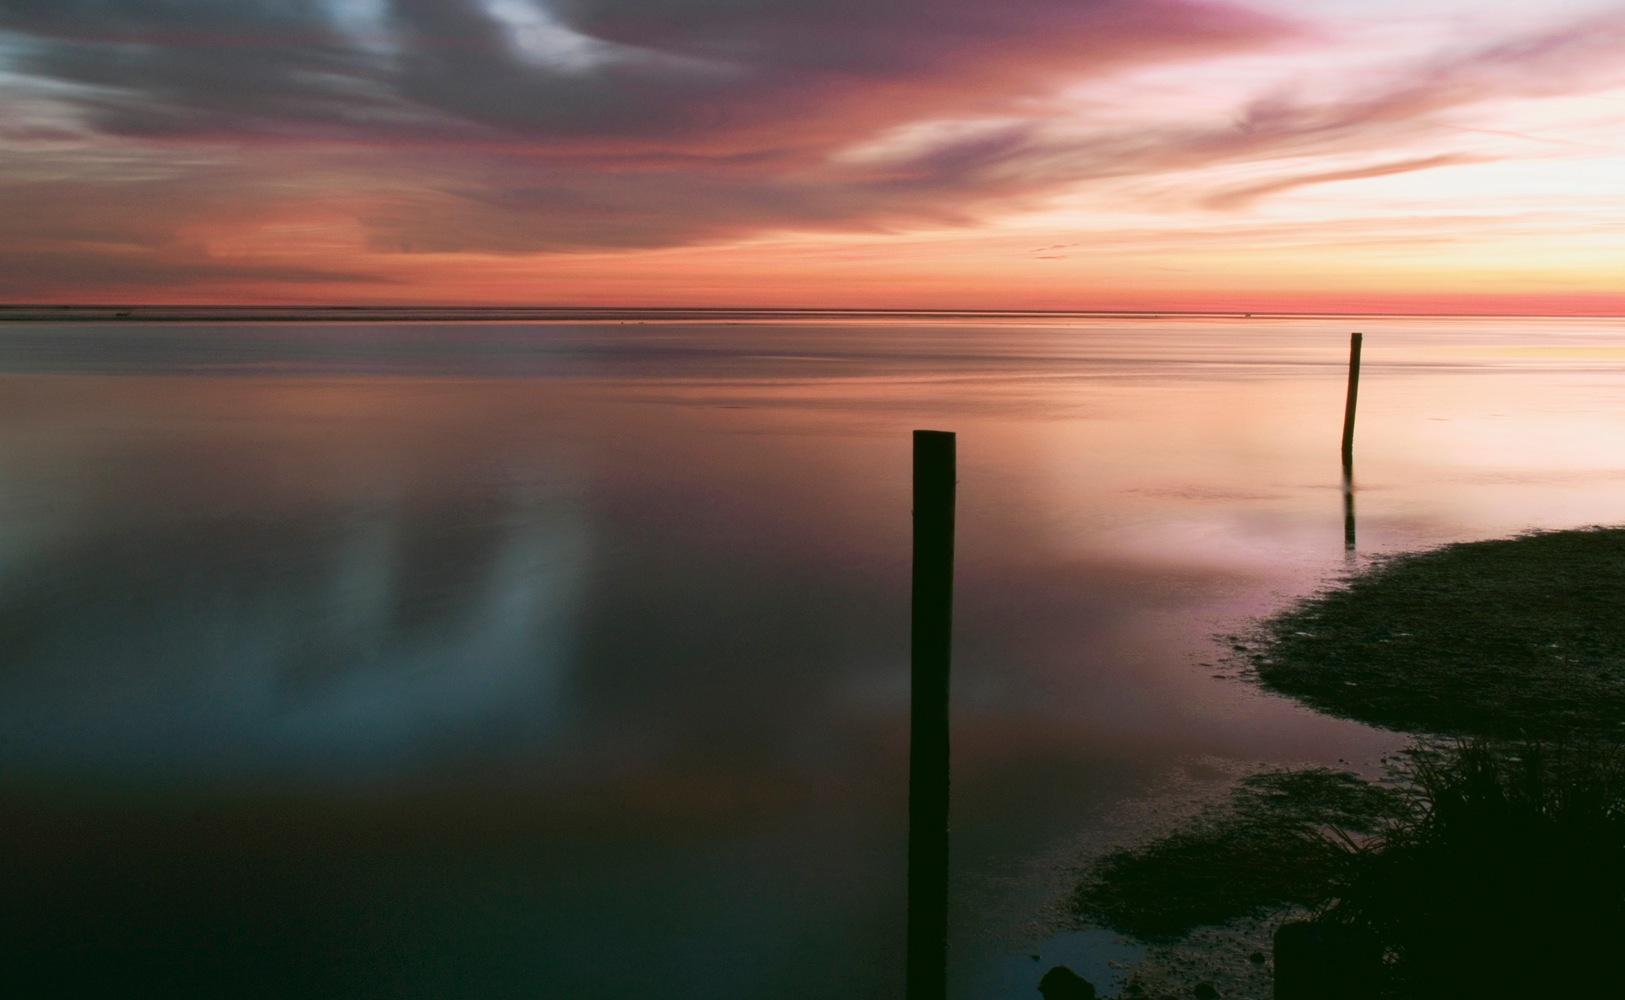 tramonto by Lauretta Michelutti